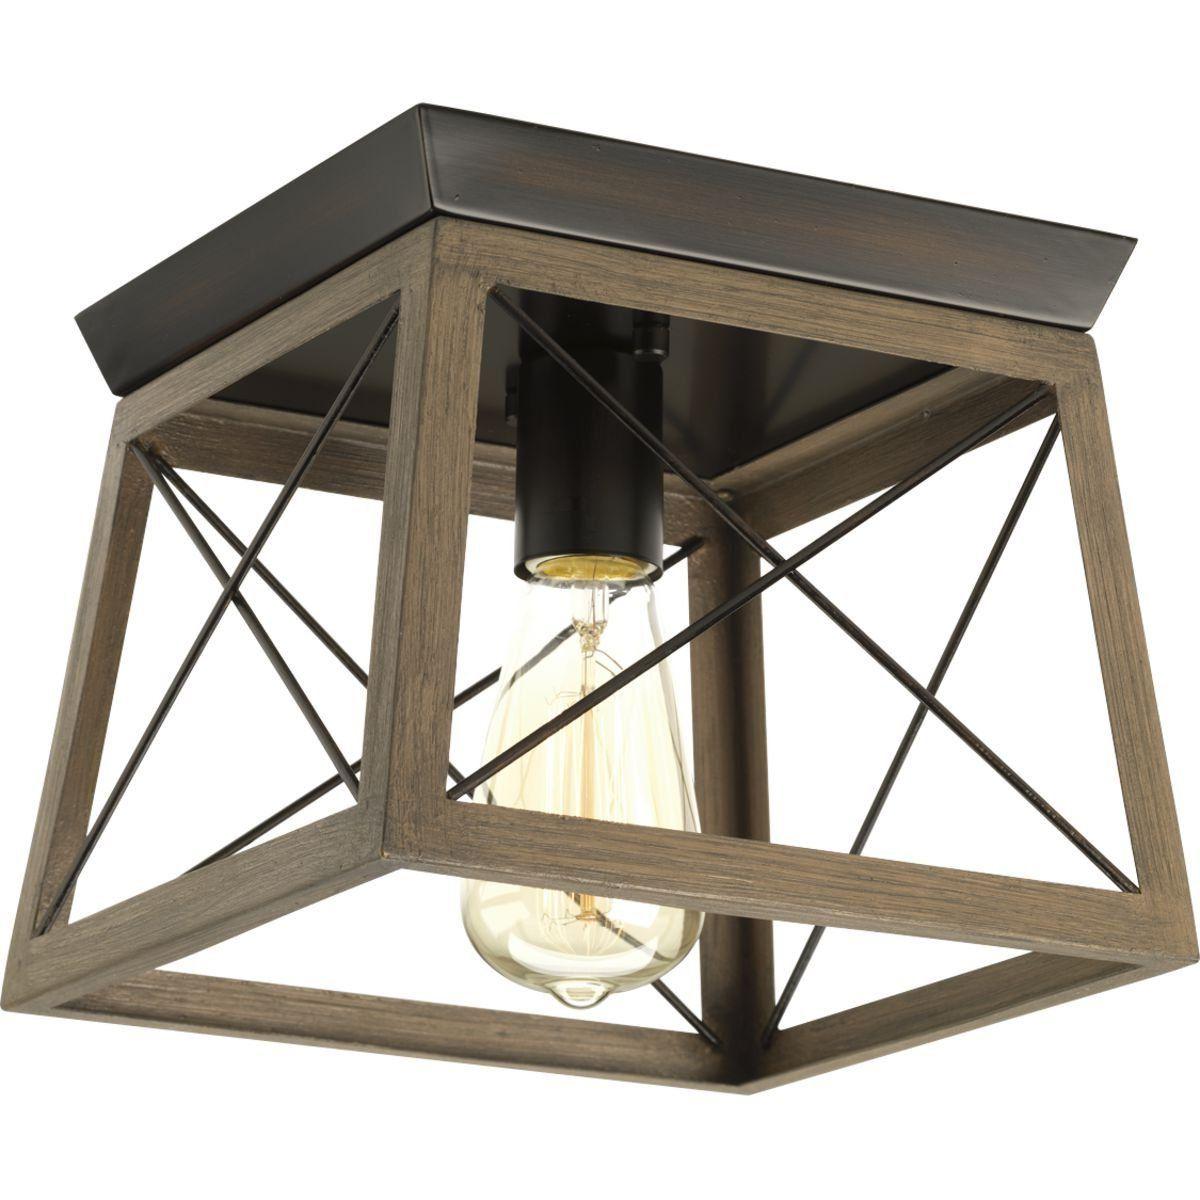 "Delon 1 Light Lantern Geometric Pendants Inside Widely Used Progress Lighting P350022 Briarwood Single Light 9 1/2"" Wide (View 3 of 20)"